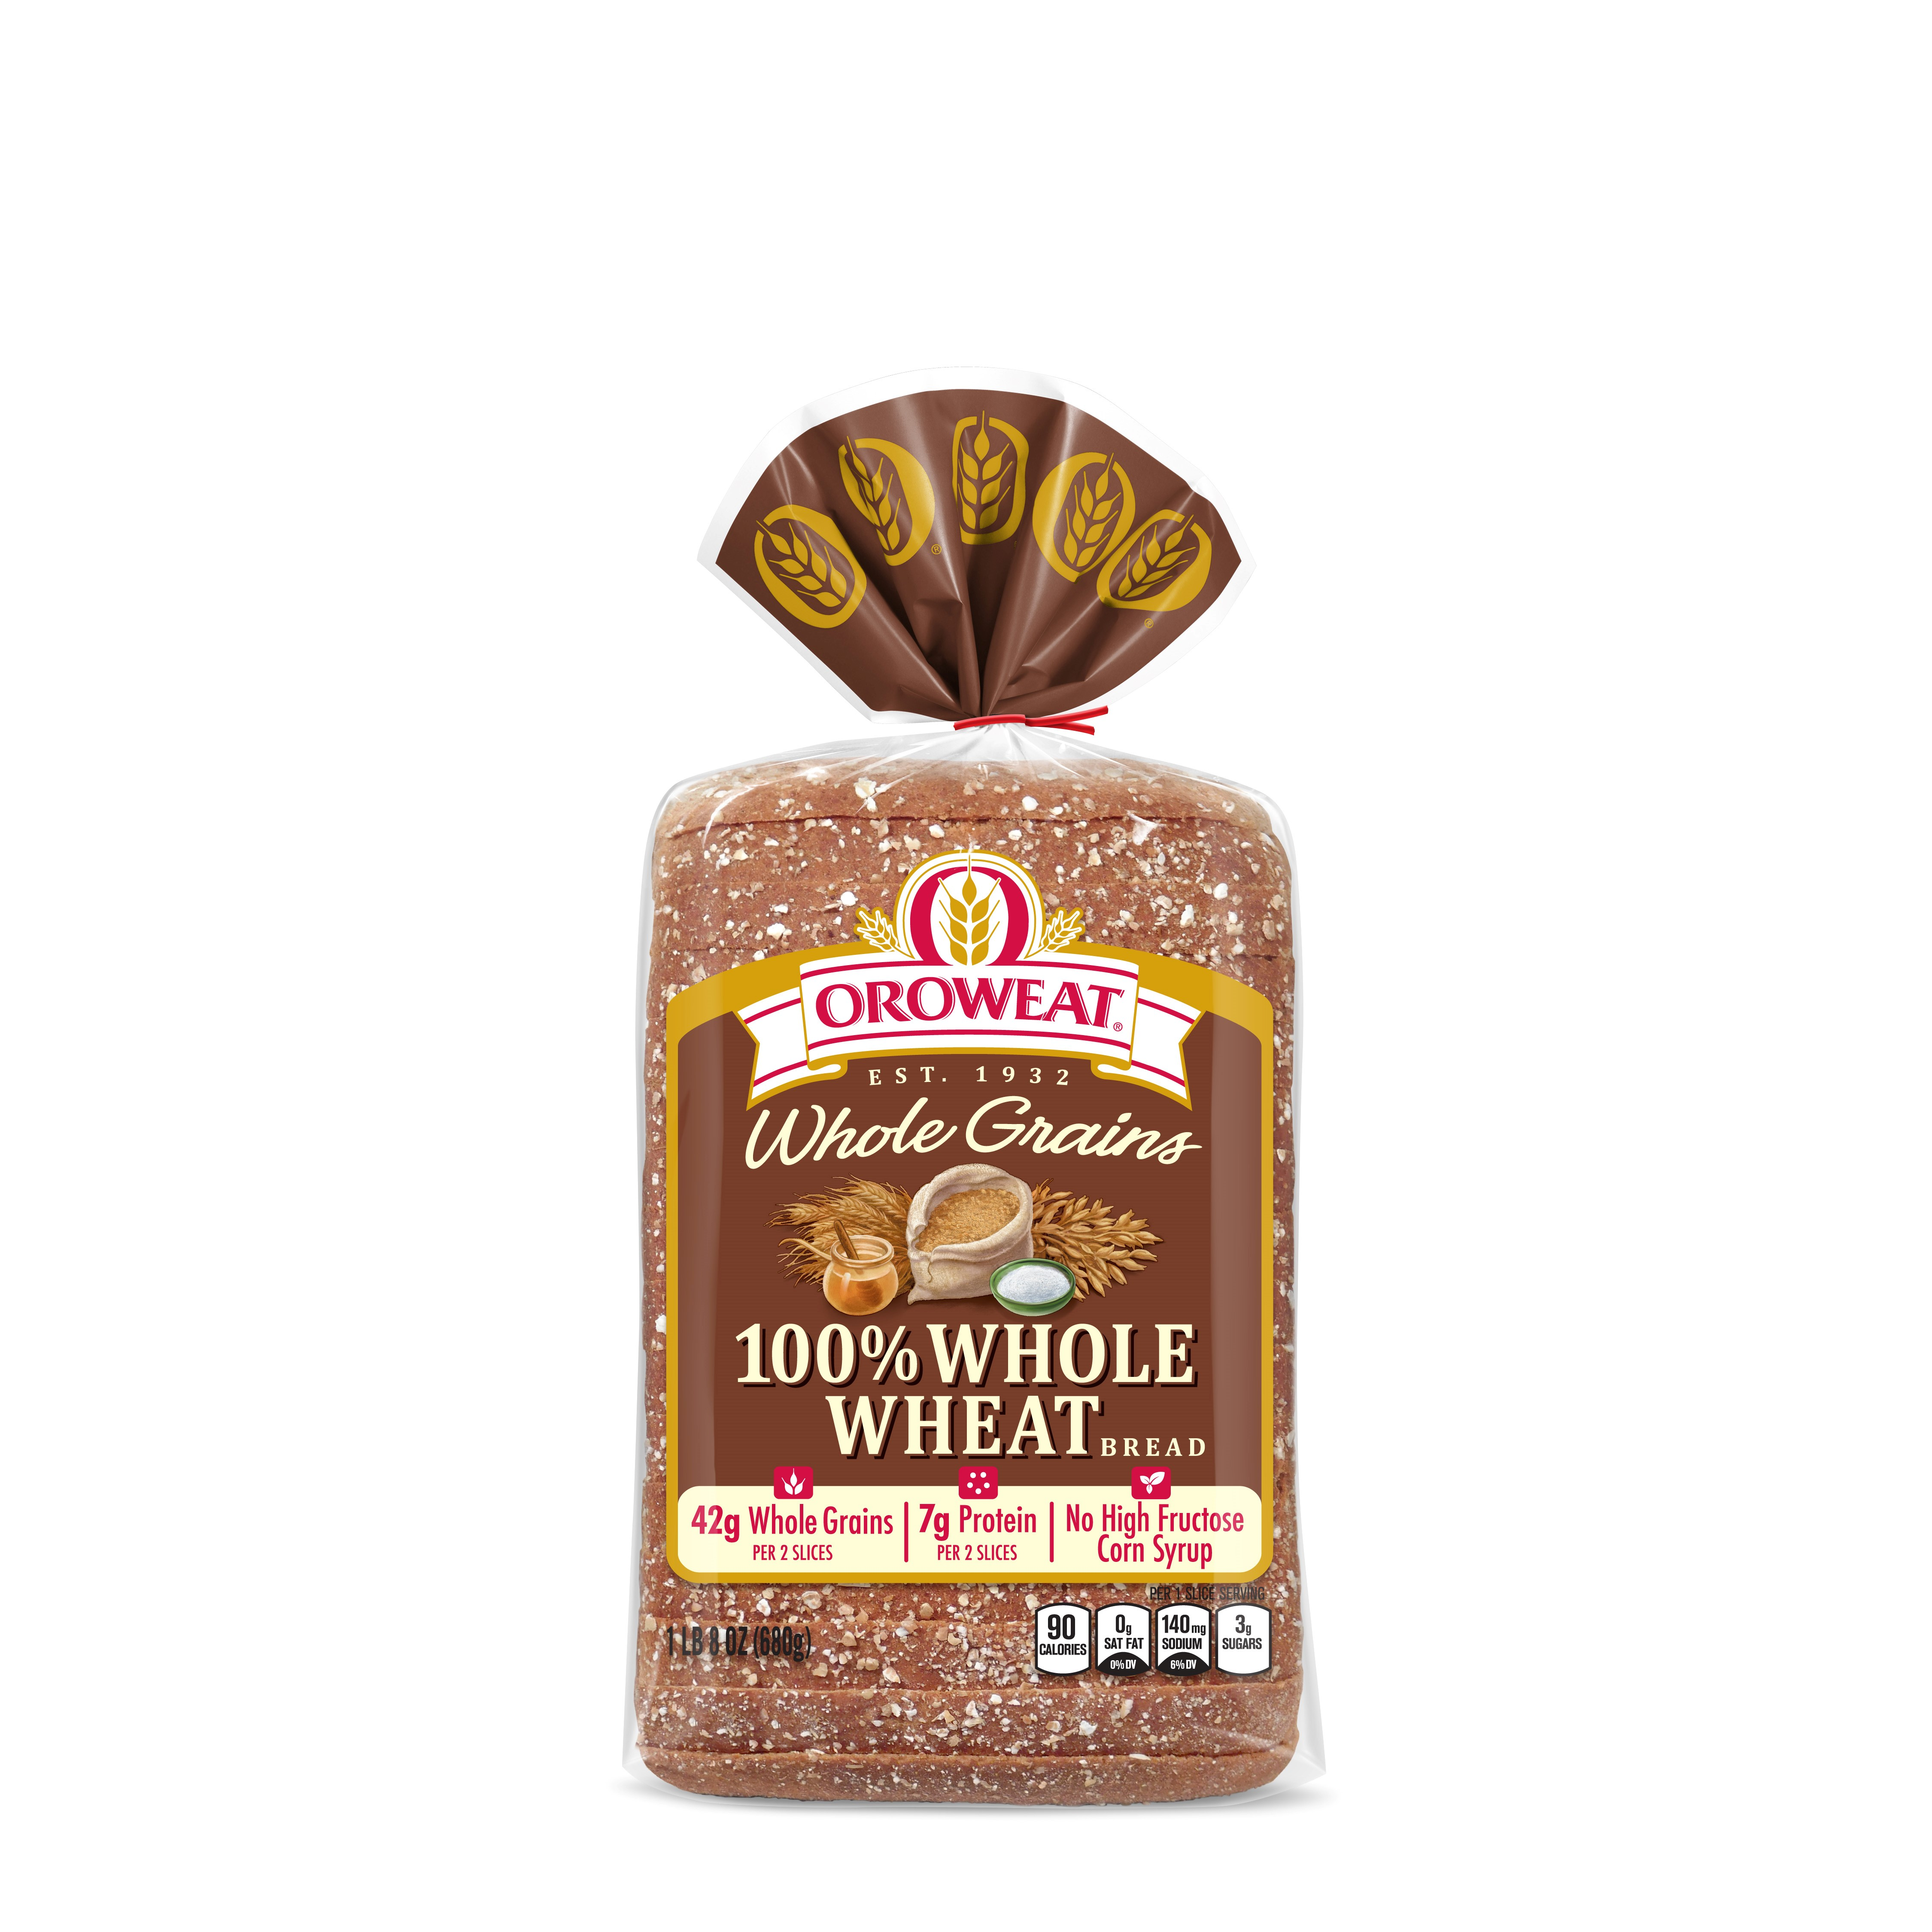 Oroweat Whole Grains 100% Whole Wheat Bread 24 Oz